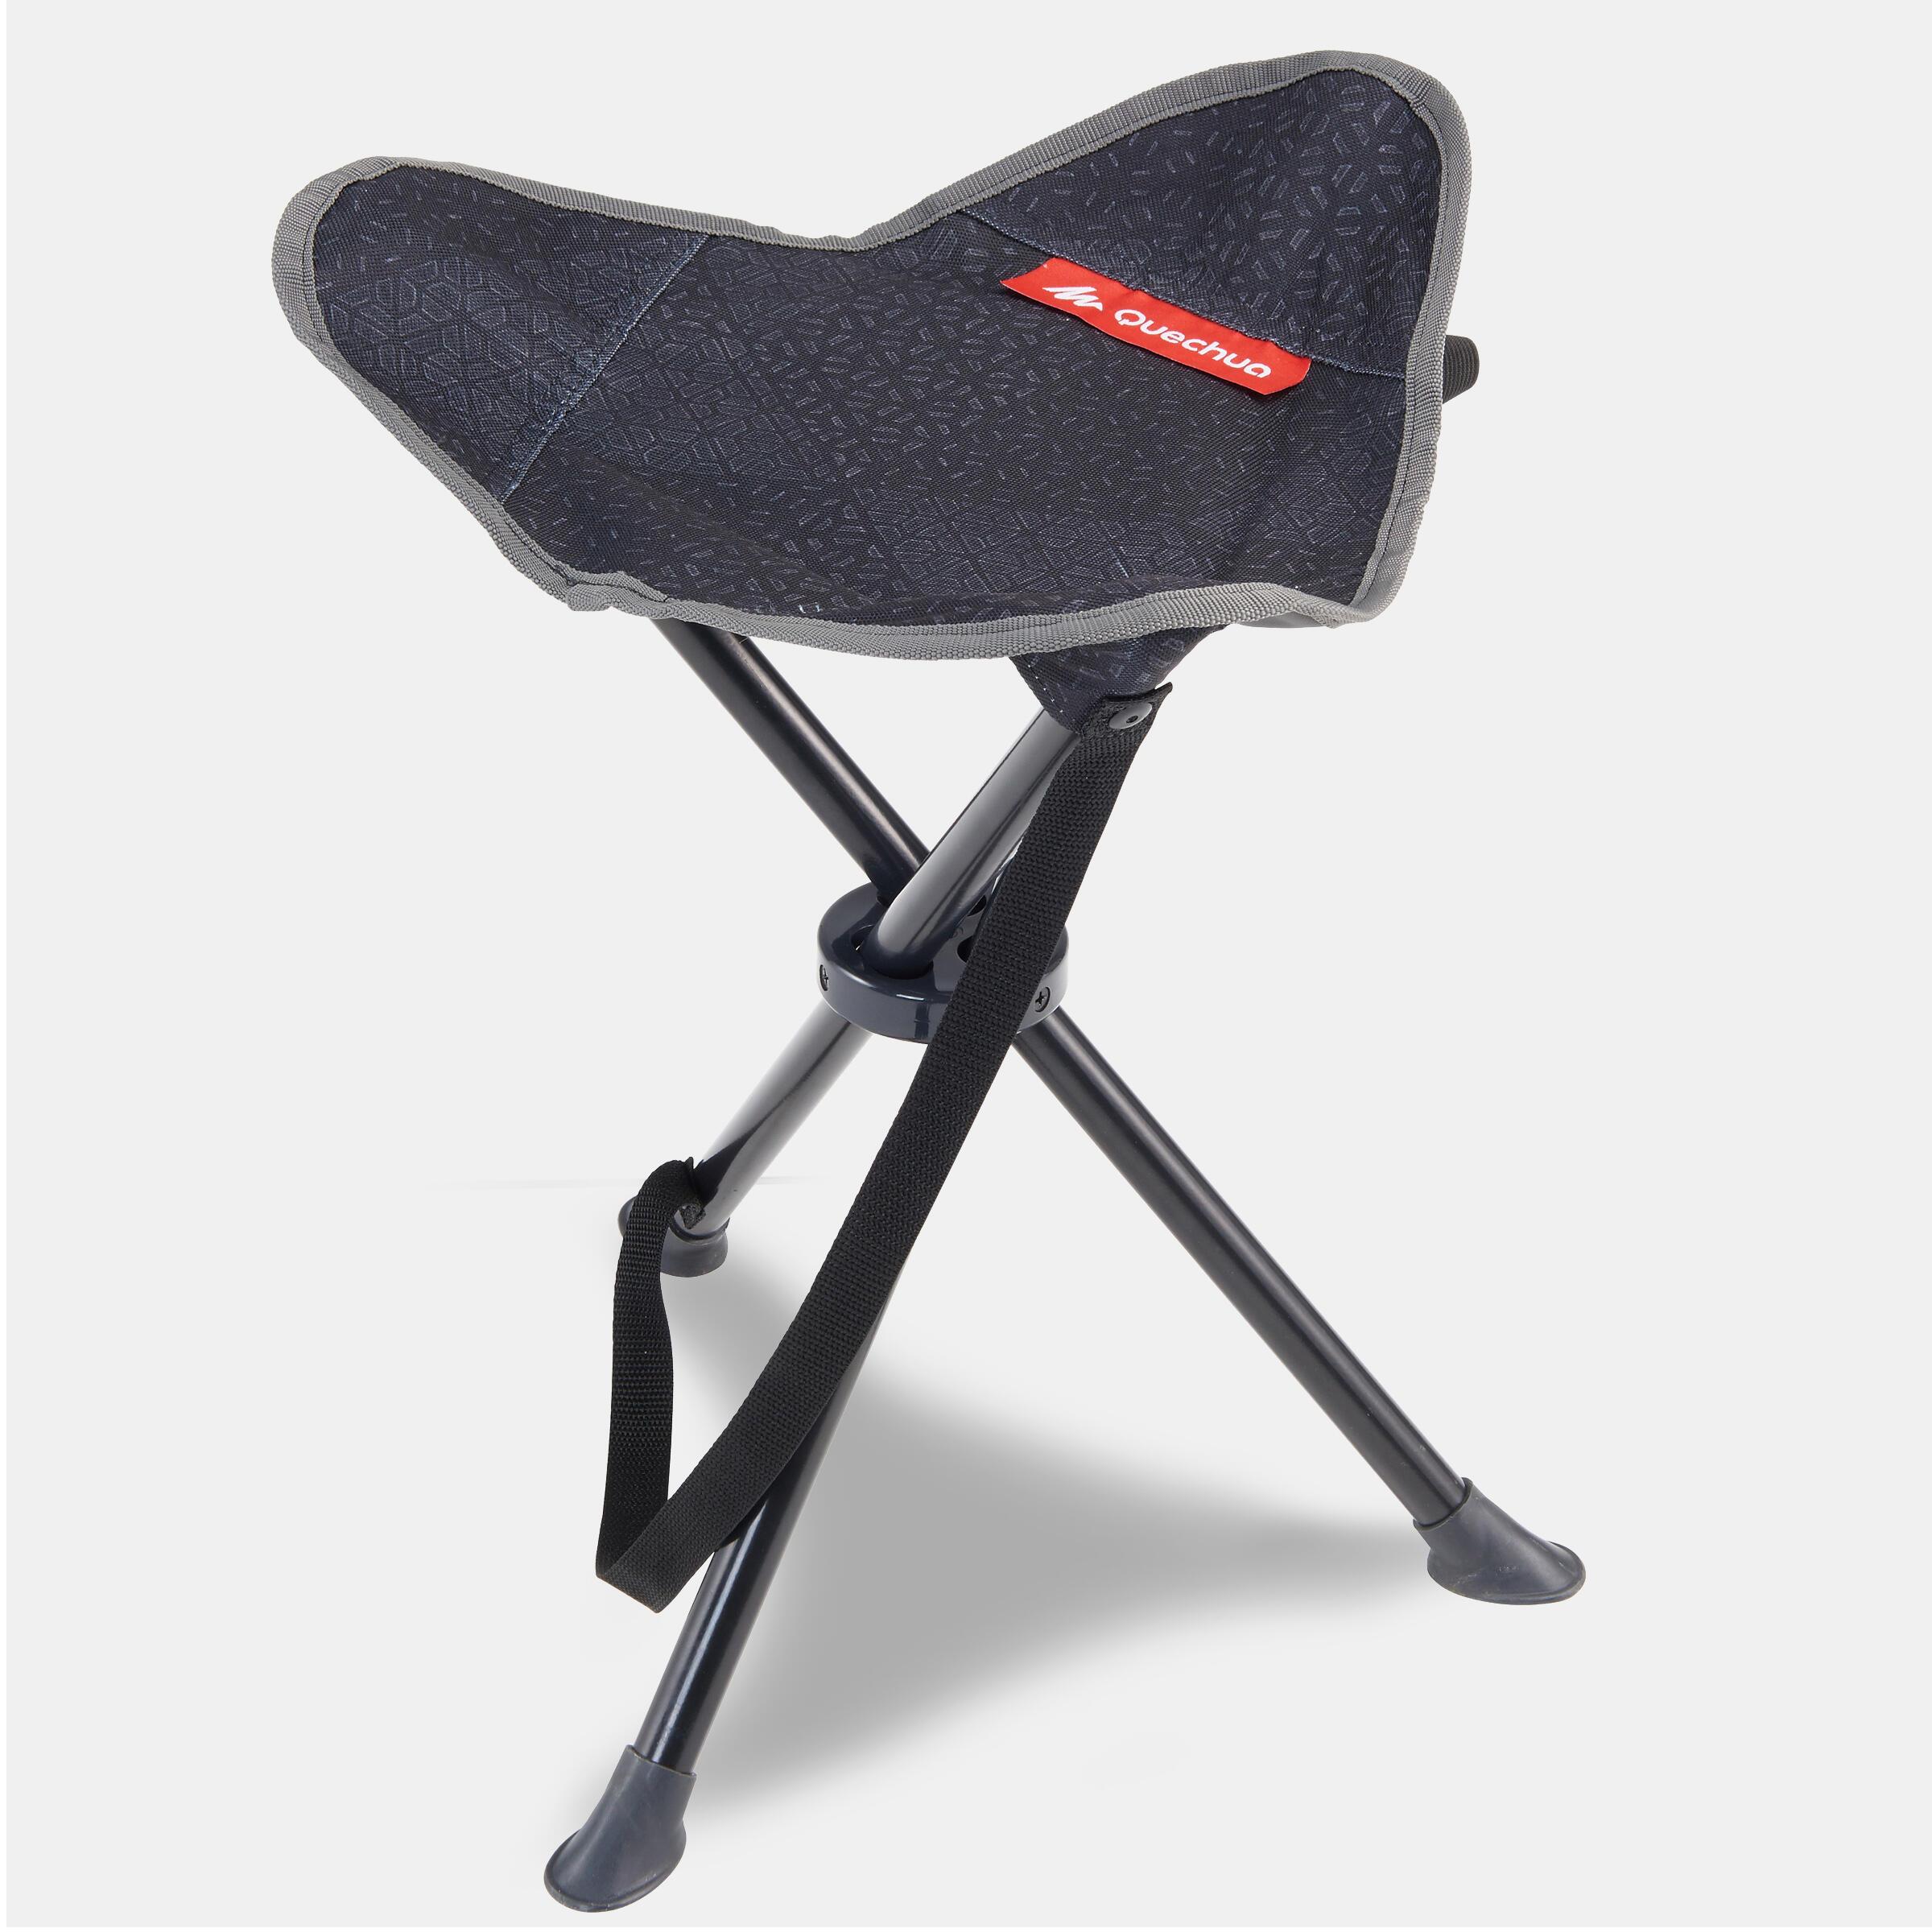 Camping tripod (Foldable) Stool